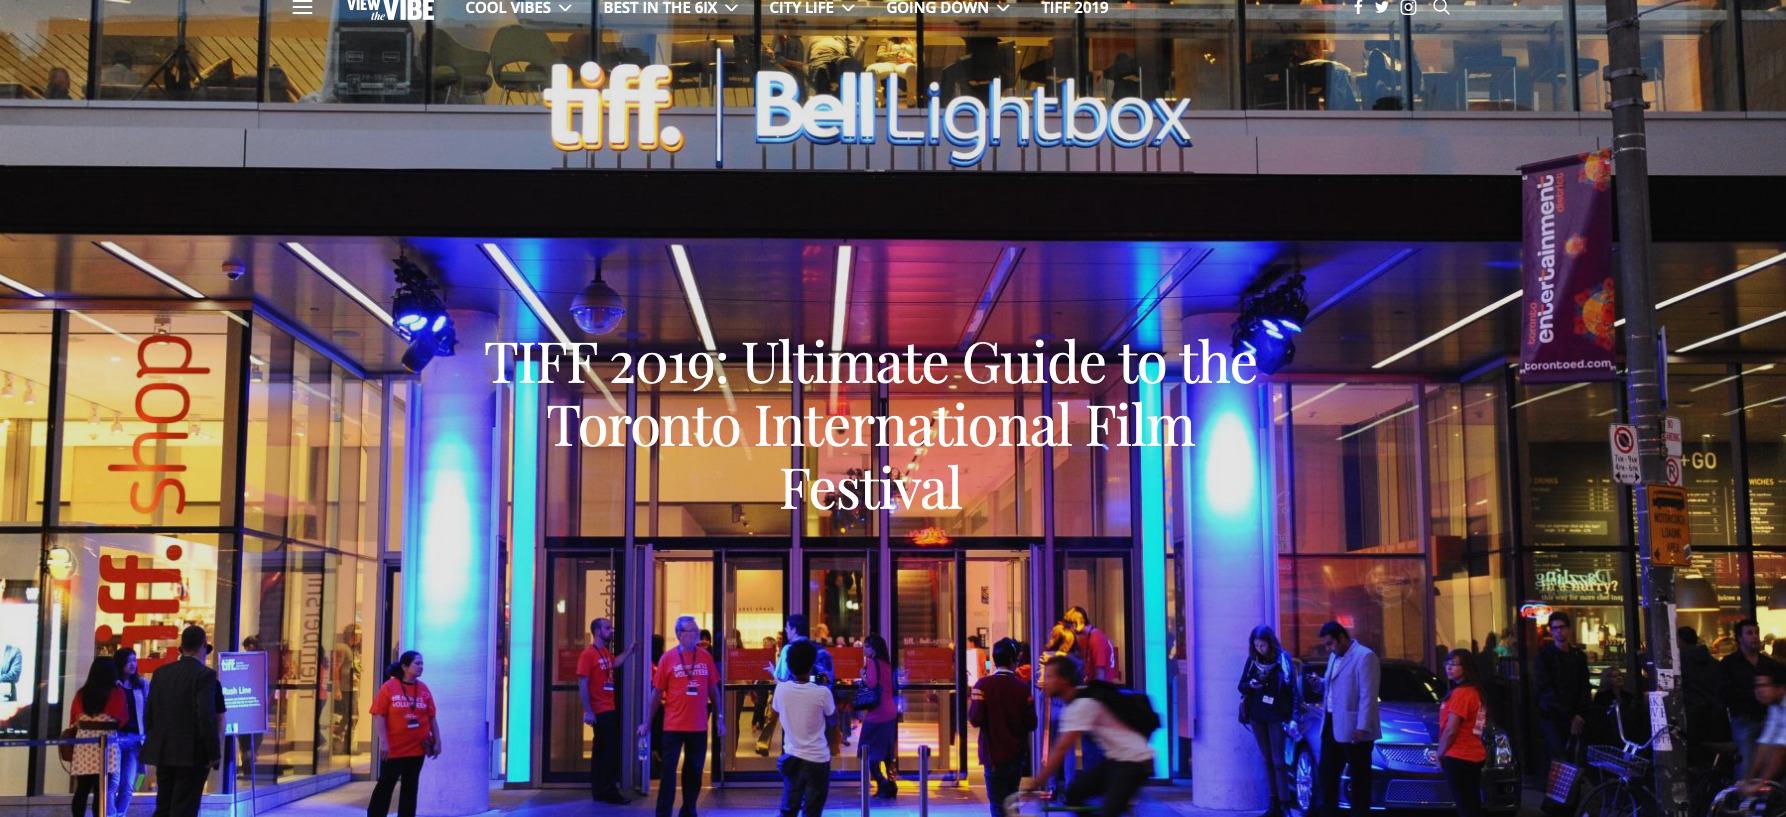 Screenshot_2019-09-04 TIFF 2019 Ultimate Guide to the Toronto International Film Festival View the VIBE.jpg